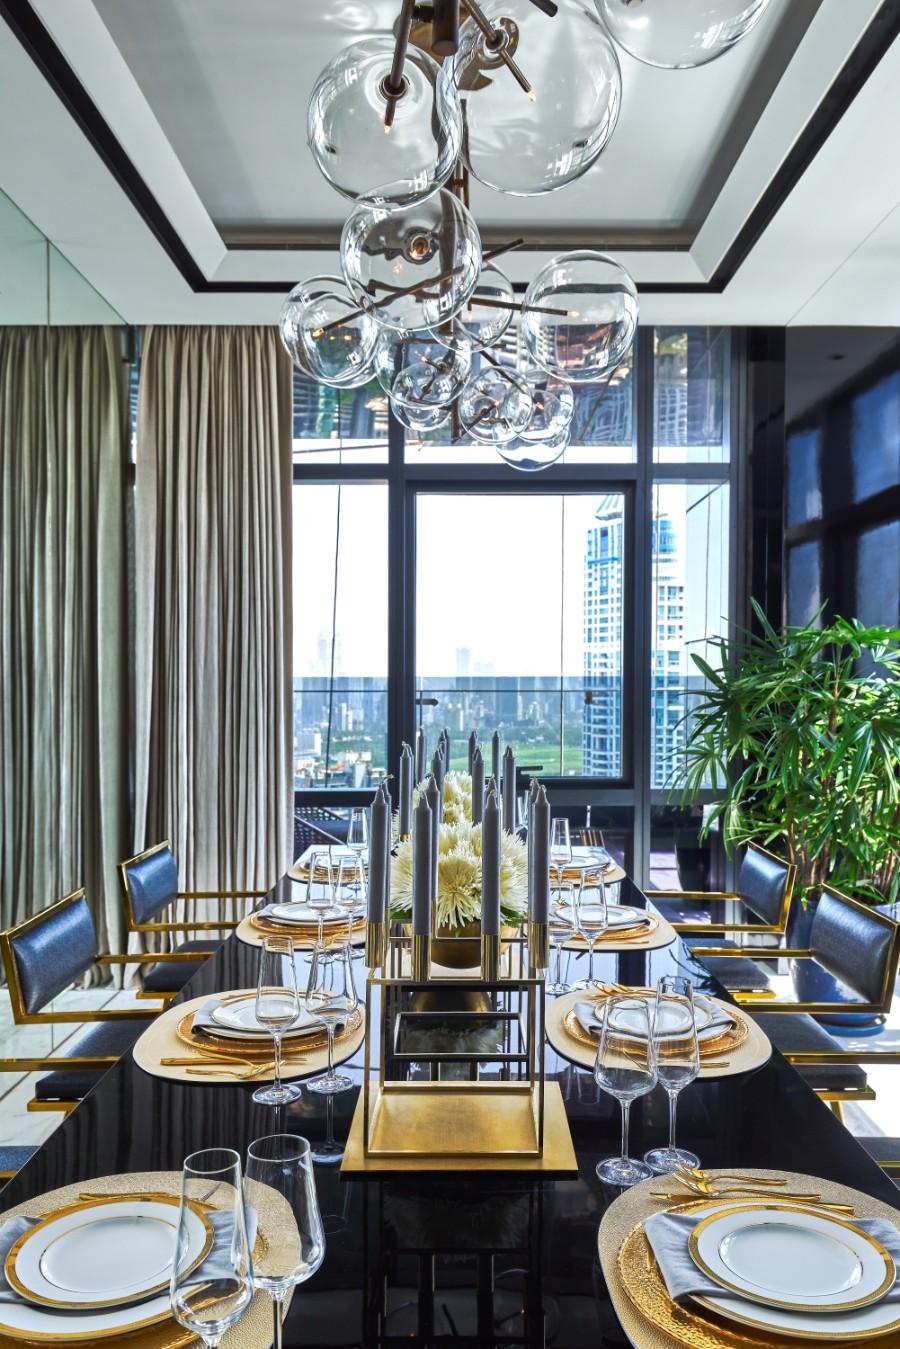 exclusive design Exclusive Design: Altamount Residence by Hirsch Bedner Associates Inside Altamount Residence by Hirsch Bedner Associates 12